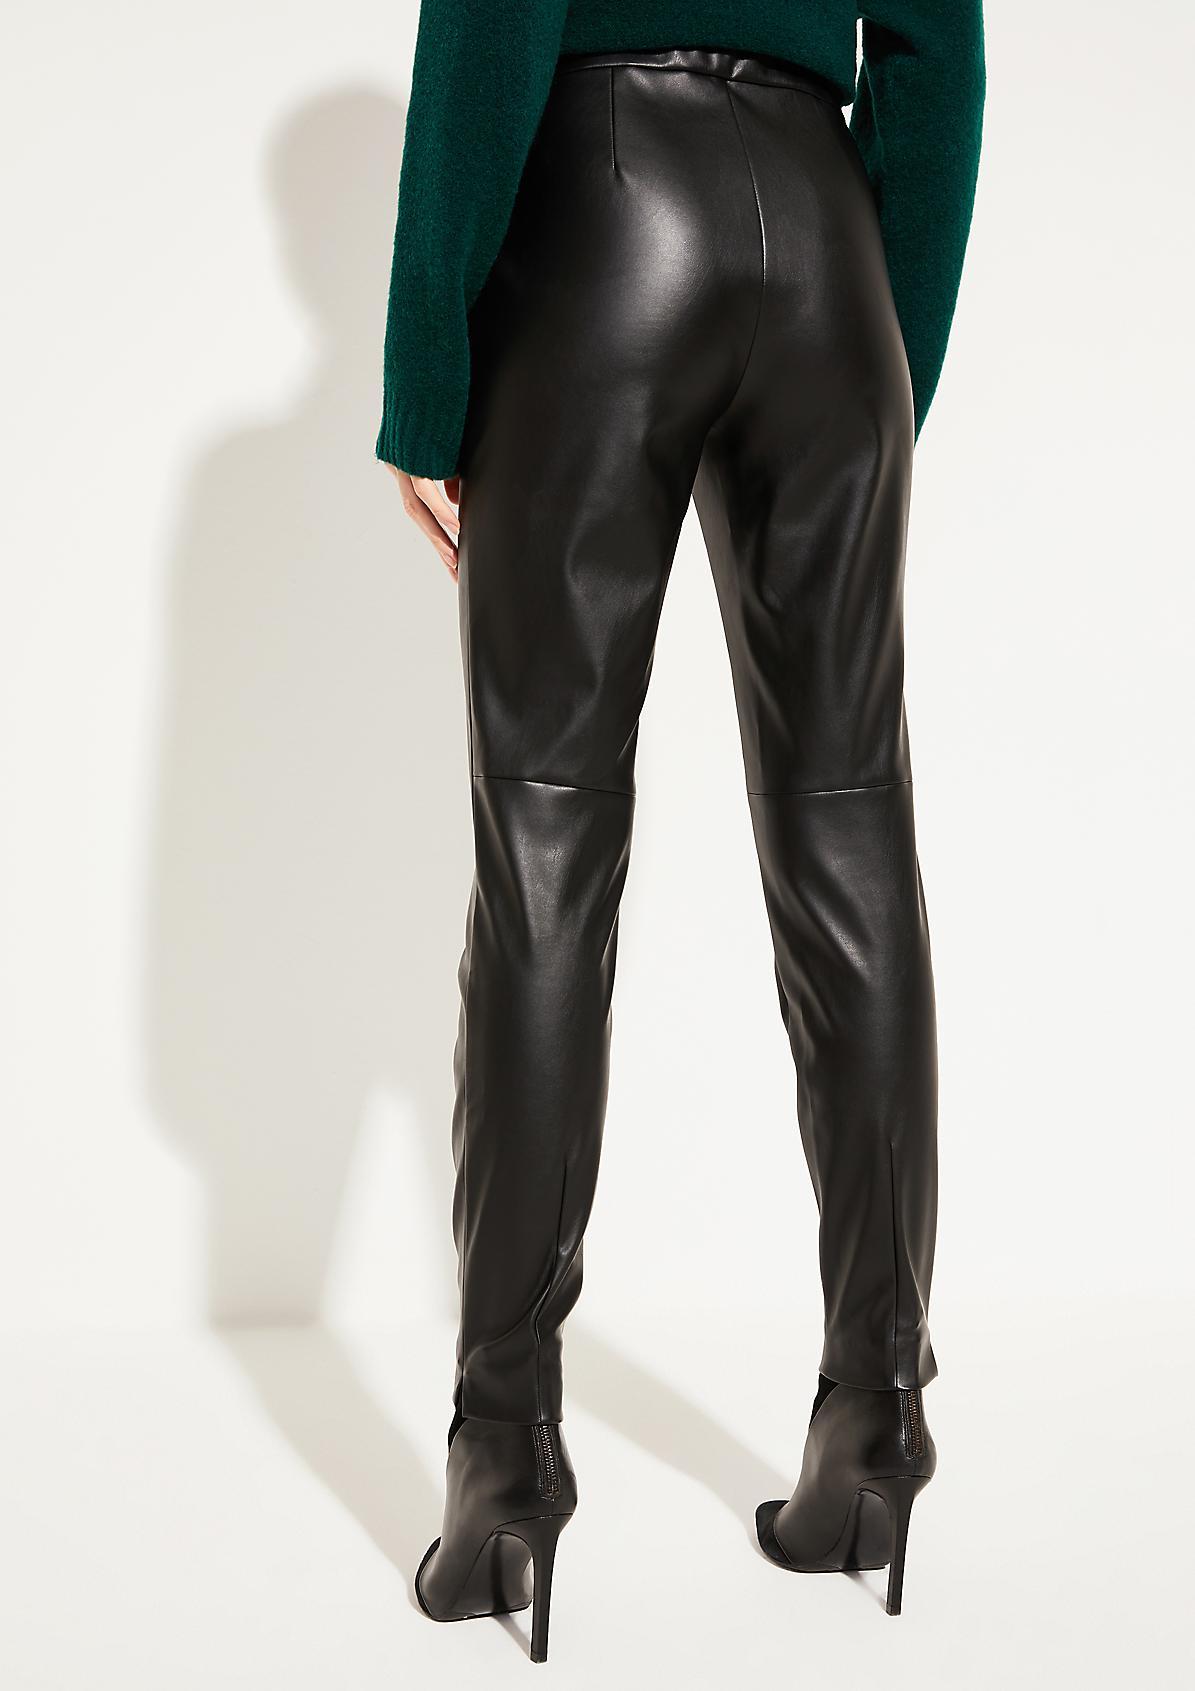 Hose aus weichem Lederimitat